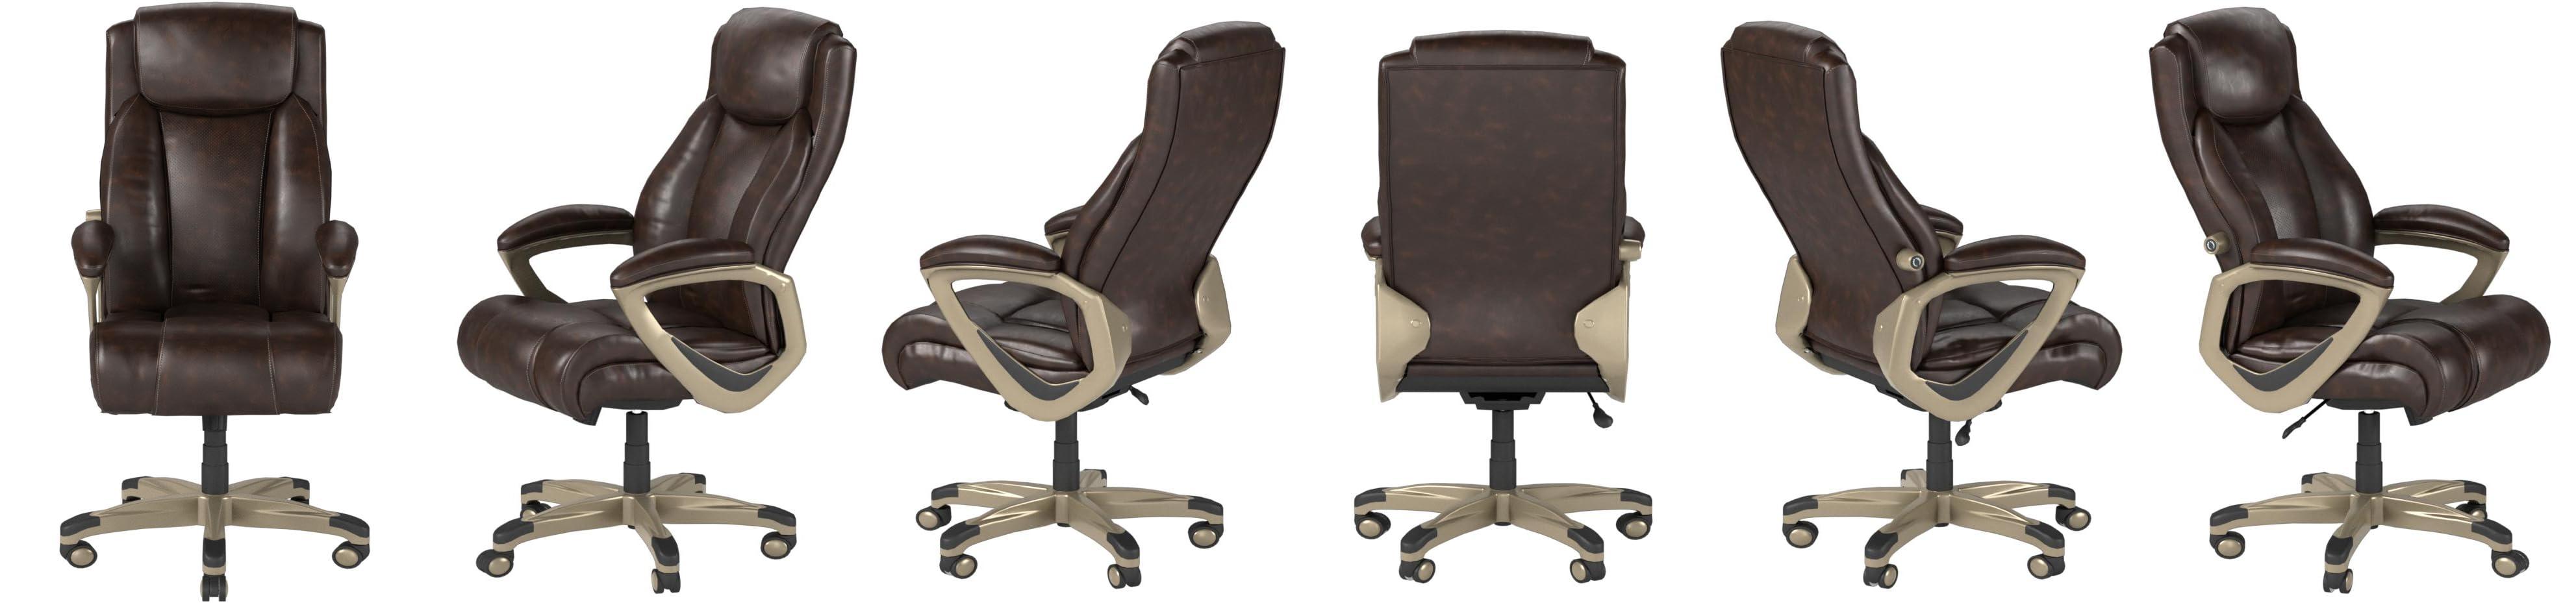 Amazon Basics Big Tall Executive Computer Desk Chair Brown With Pewter Finish Furniture Decor Amazon Com